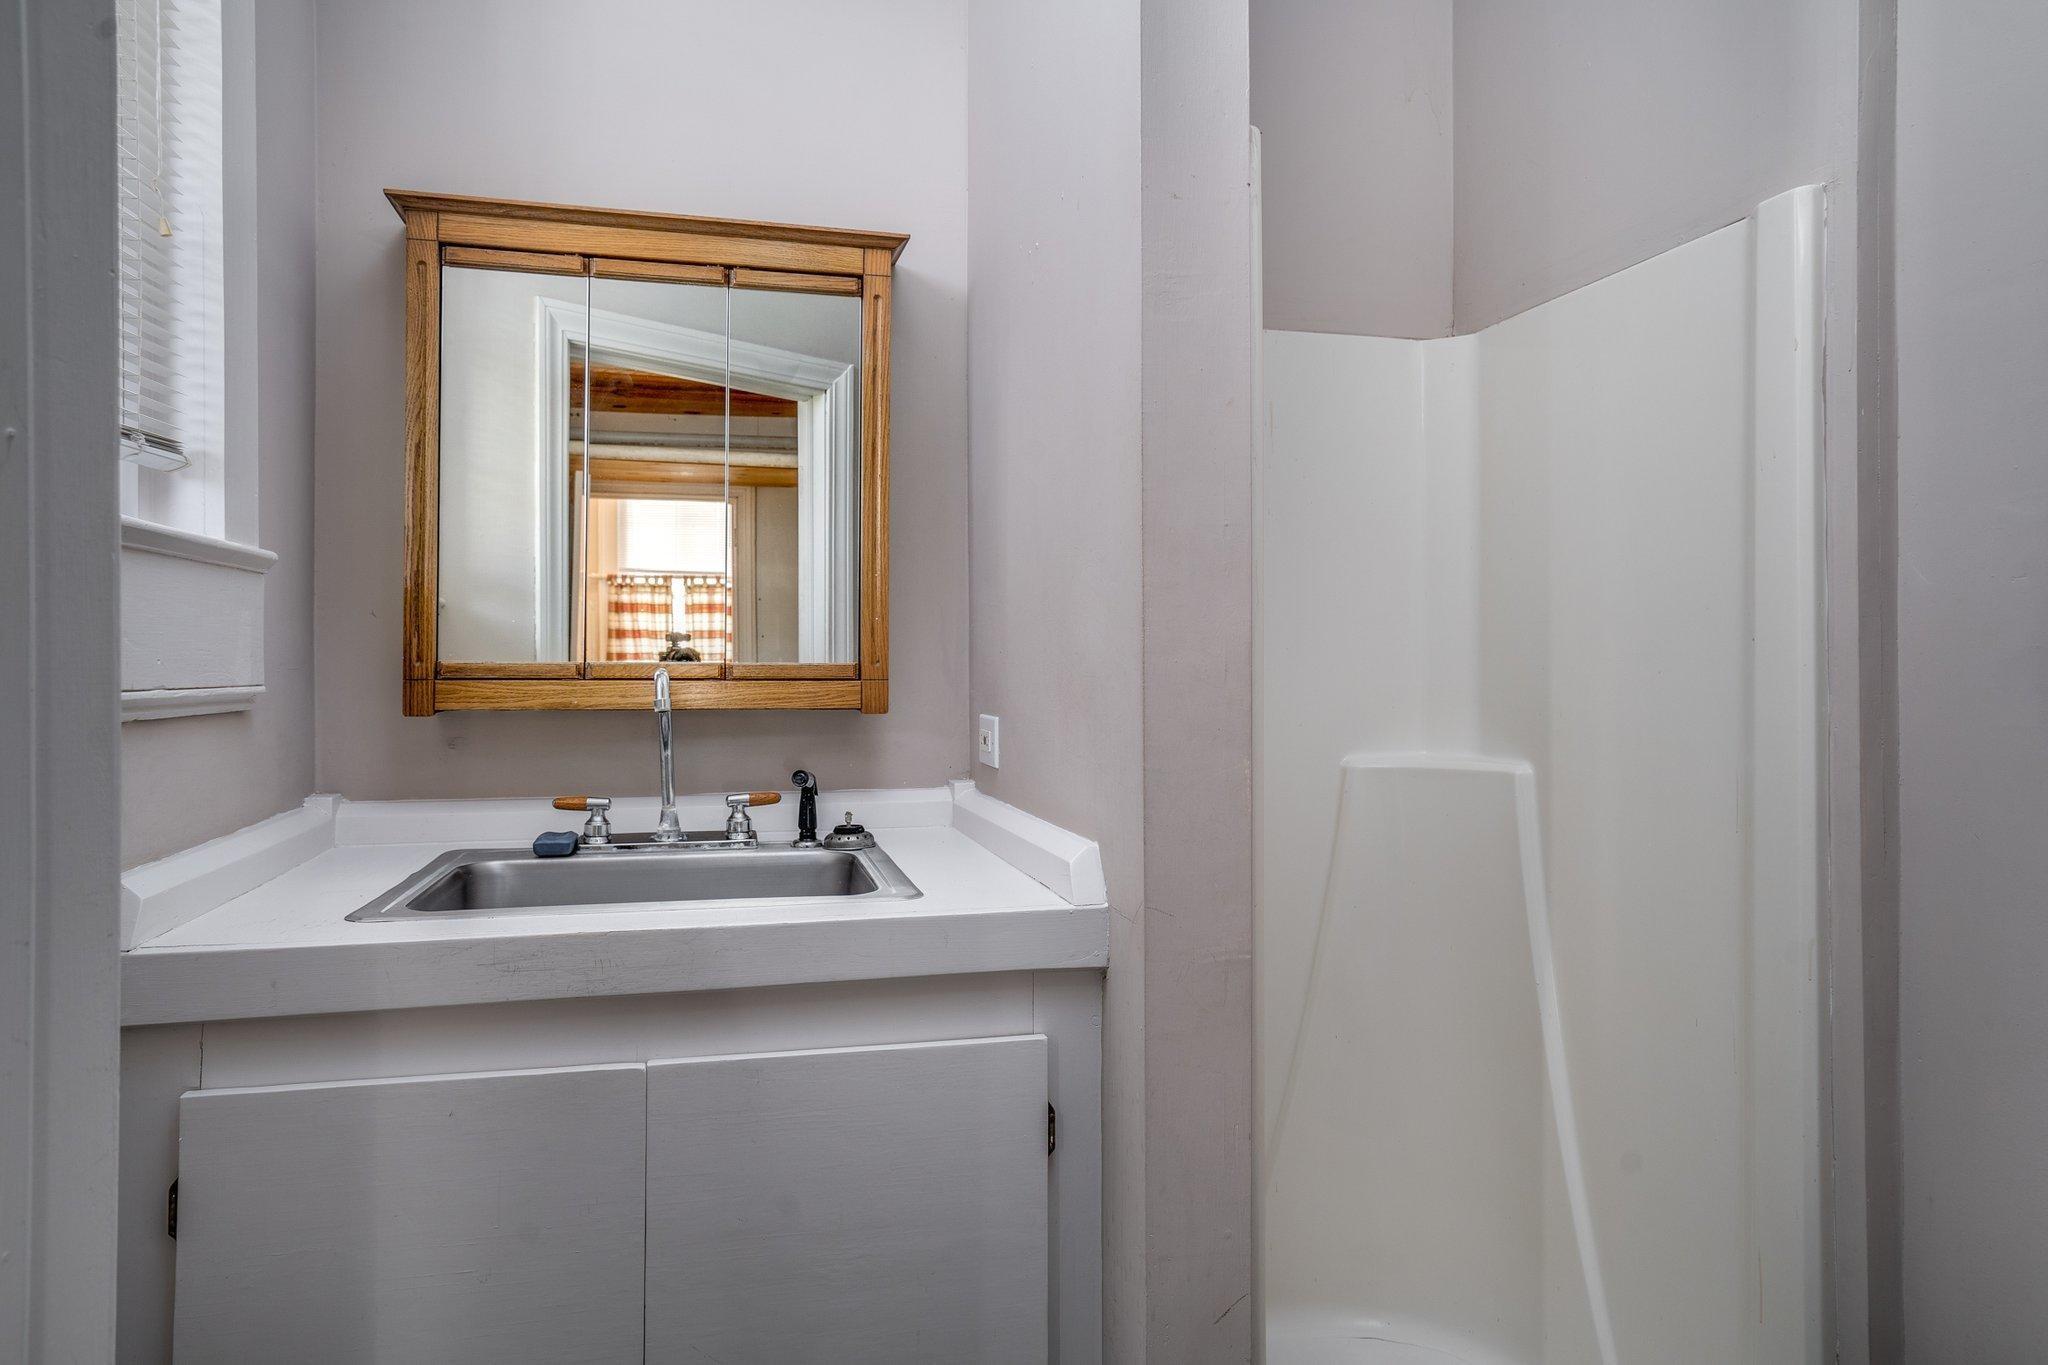 112 Church Street, Tarboro, North Carolina 27886, 3 Bedrooms Bedrooms, 15 Rooms Rooms,1 BathroomBathrooms,Single family residence,For sale,Church,100264348